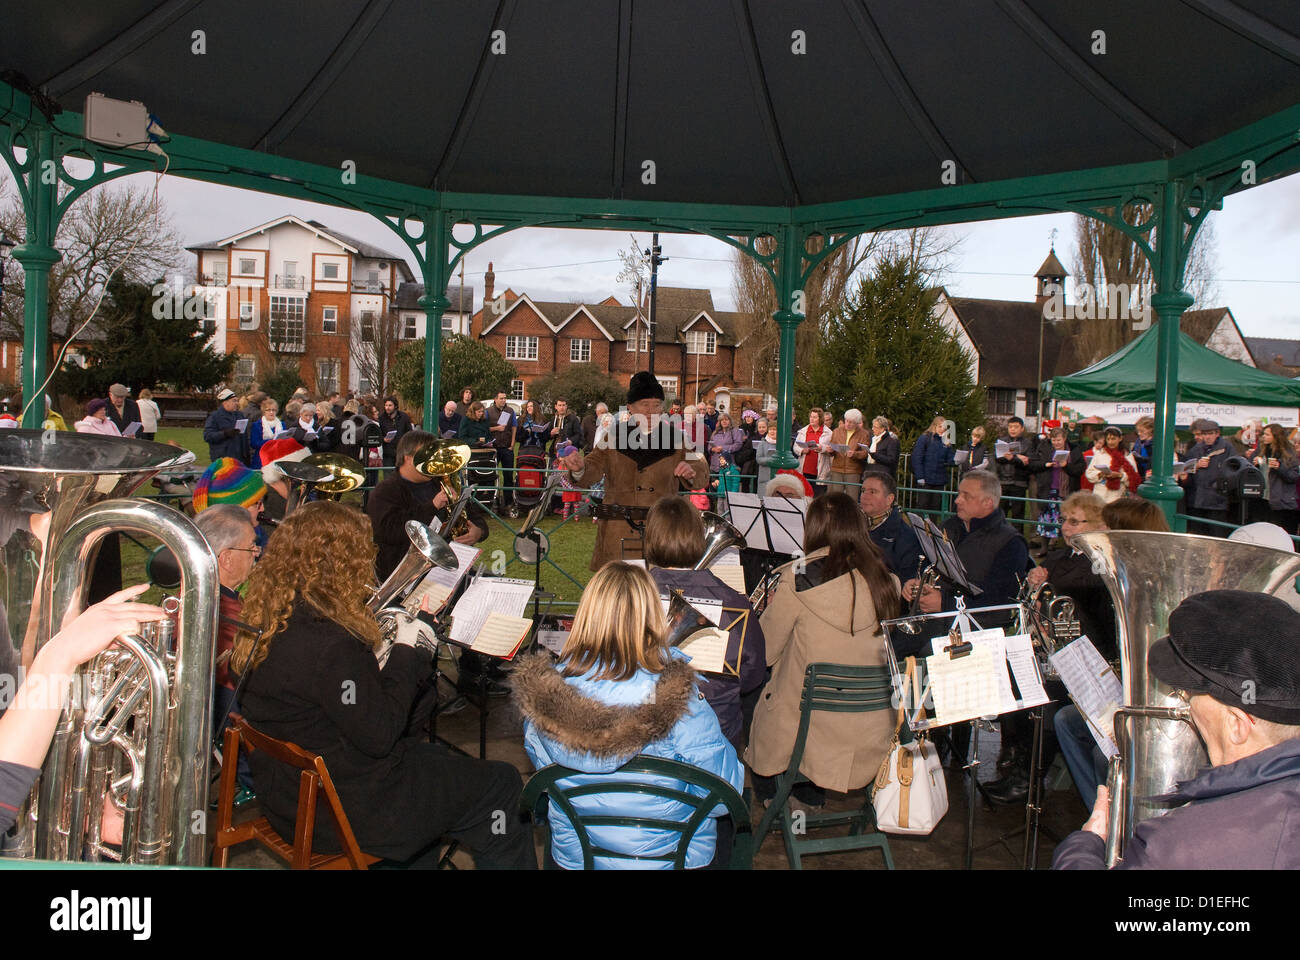 Carol service at the bandstand at christmas time, Farnham, Surrey, UK. - Stock Image